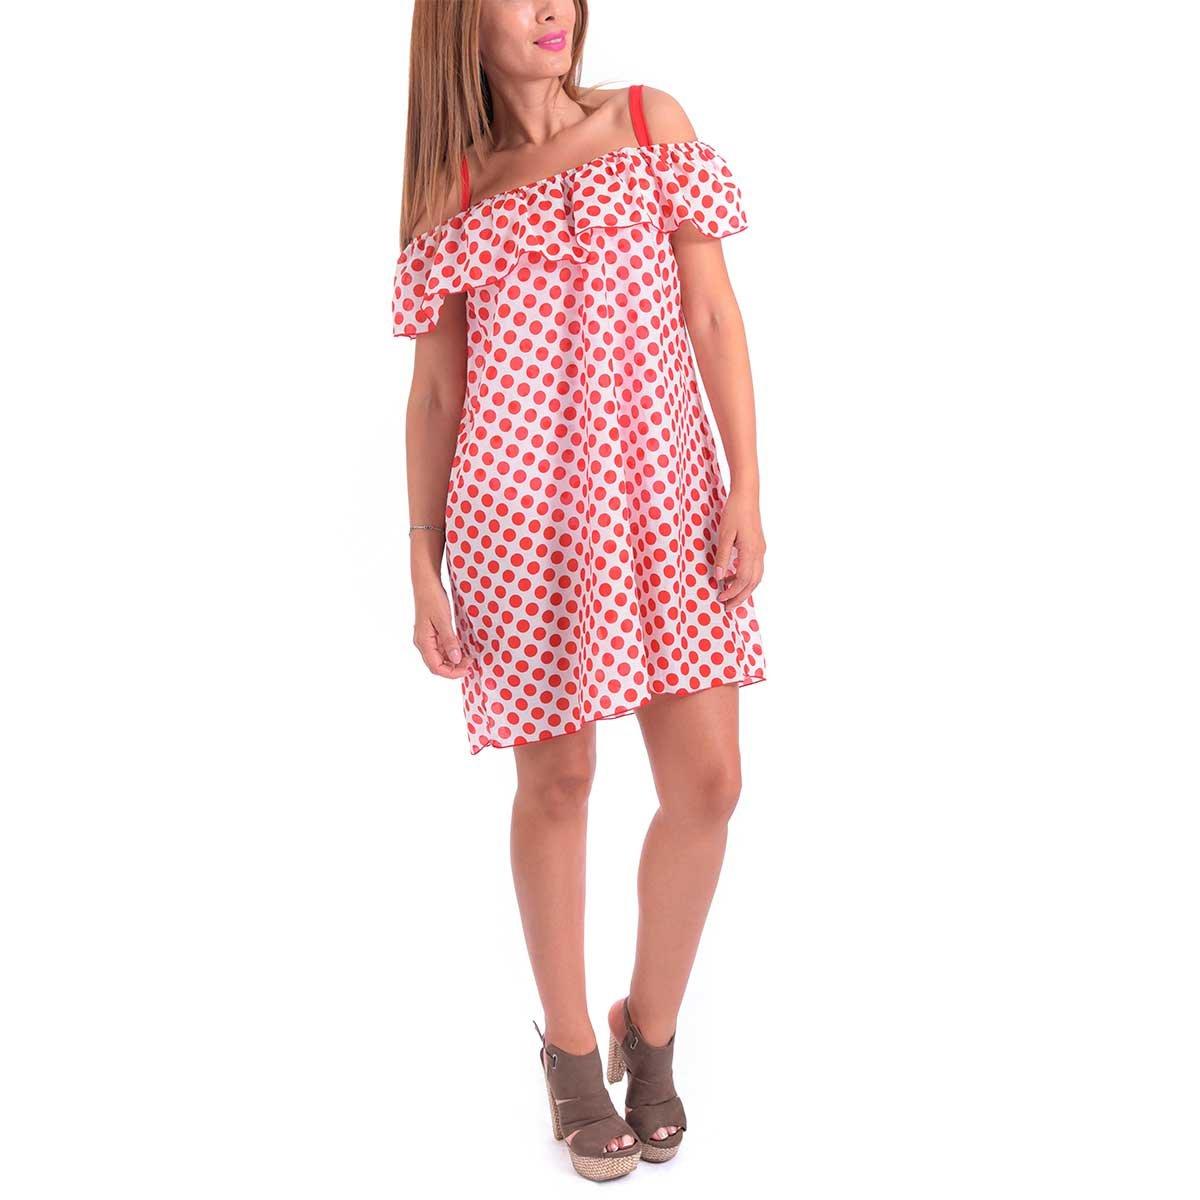 Vestido Con Olan Salida De Playa Eurosol Concept | SEARS.COM.MX - Me ...